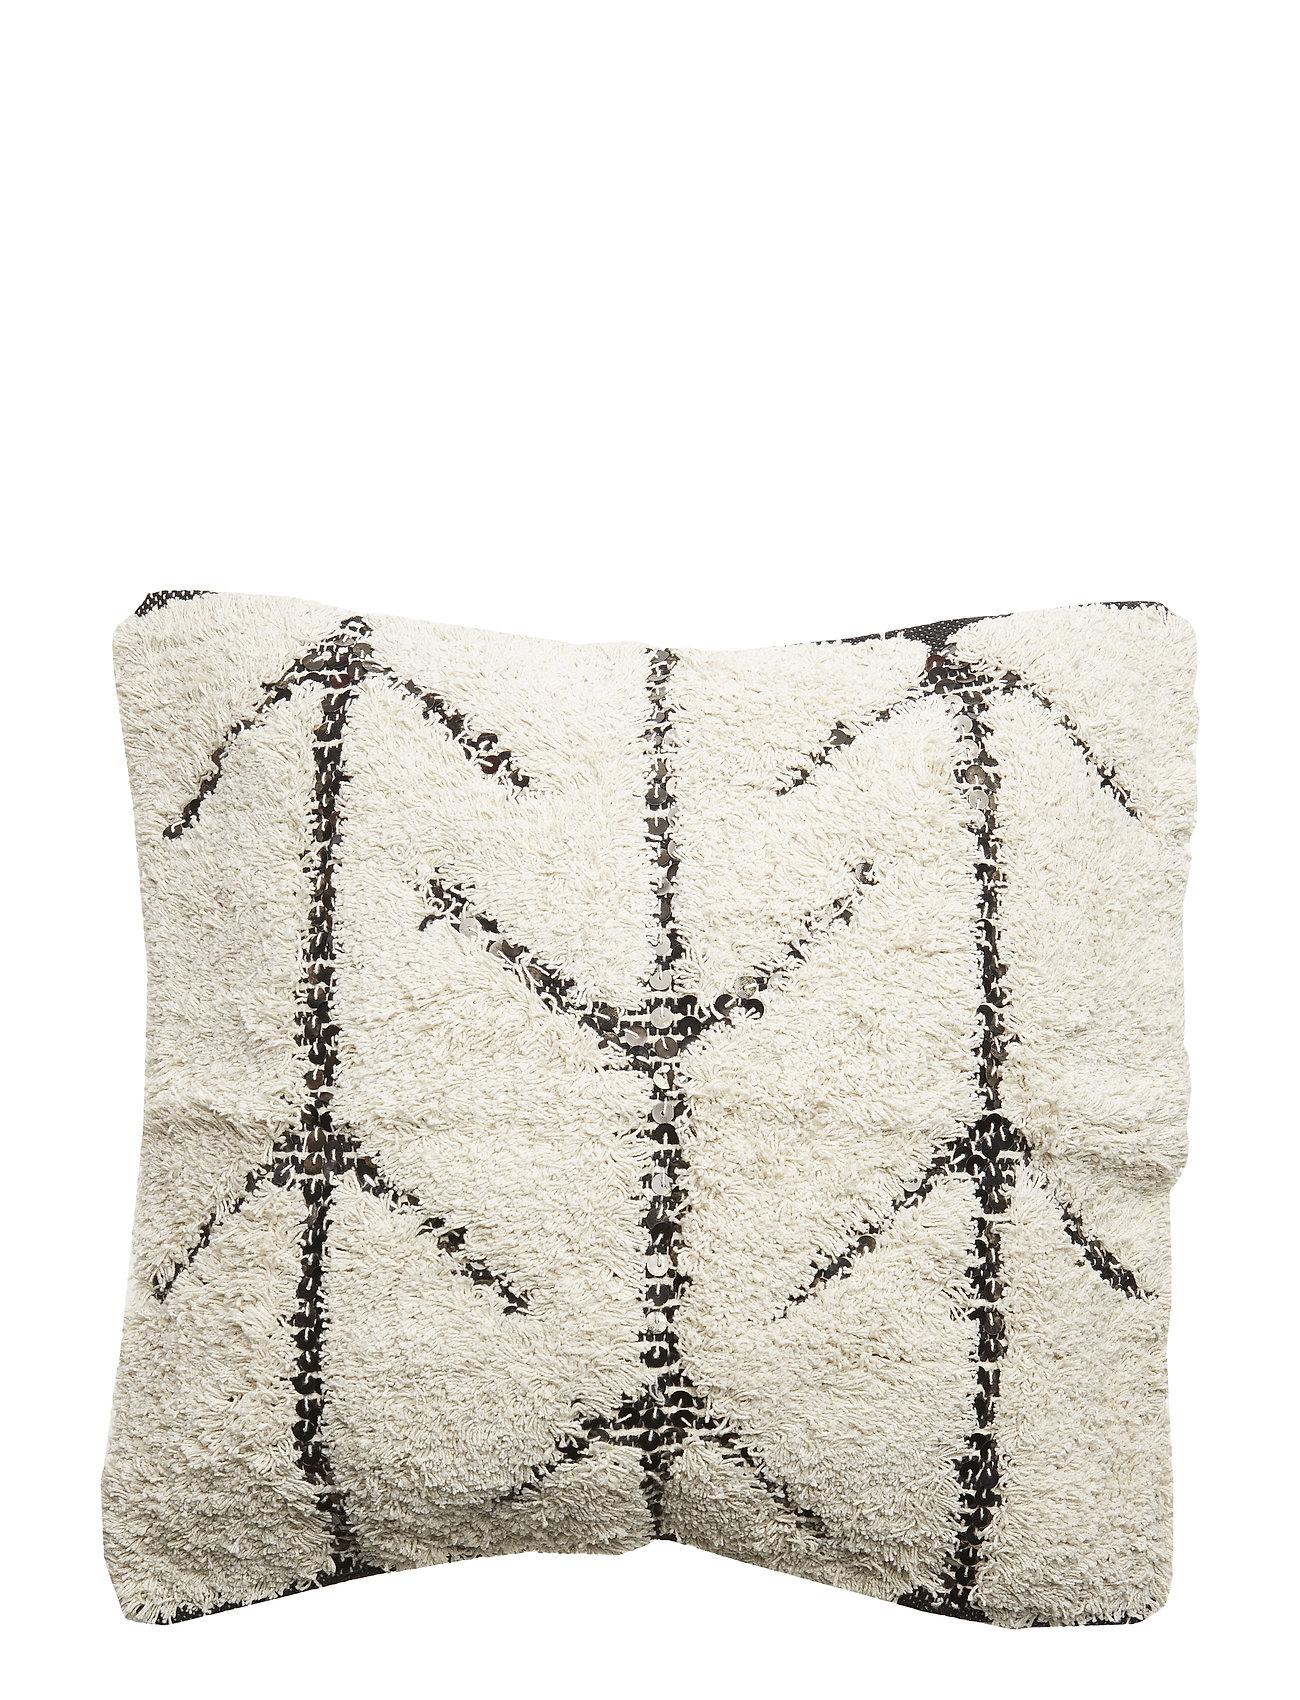 DAY Home Bridal cushion cover - BLACK/WHITE